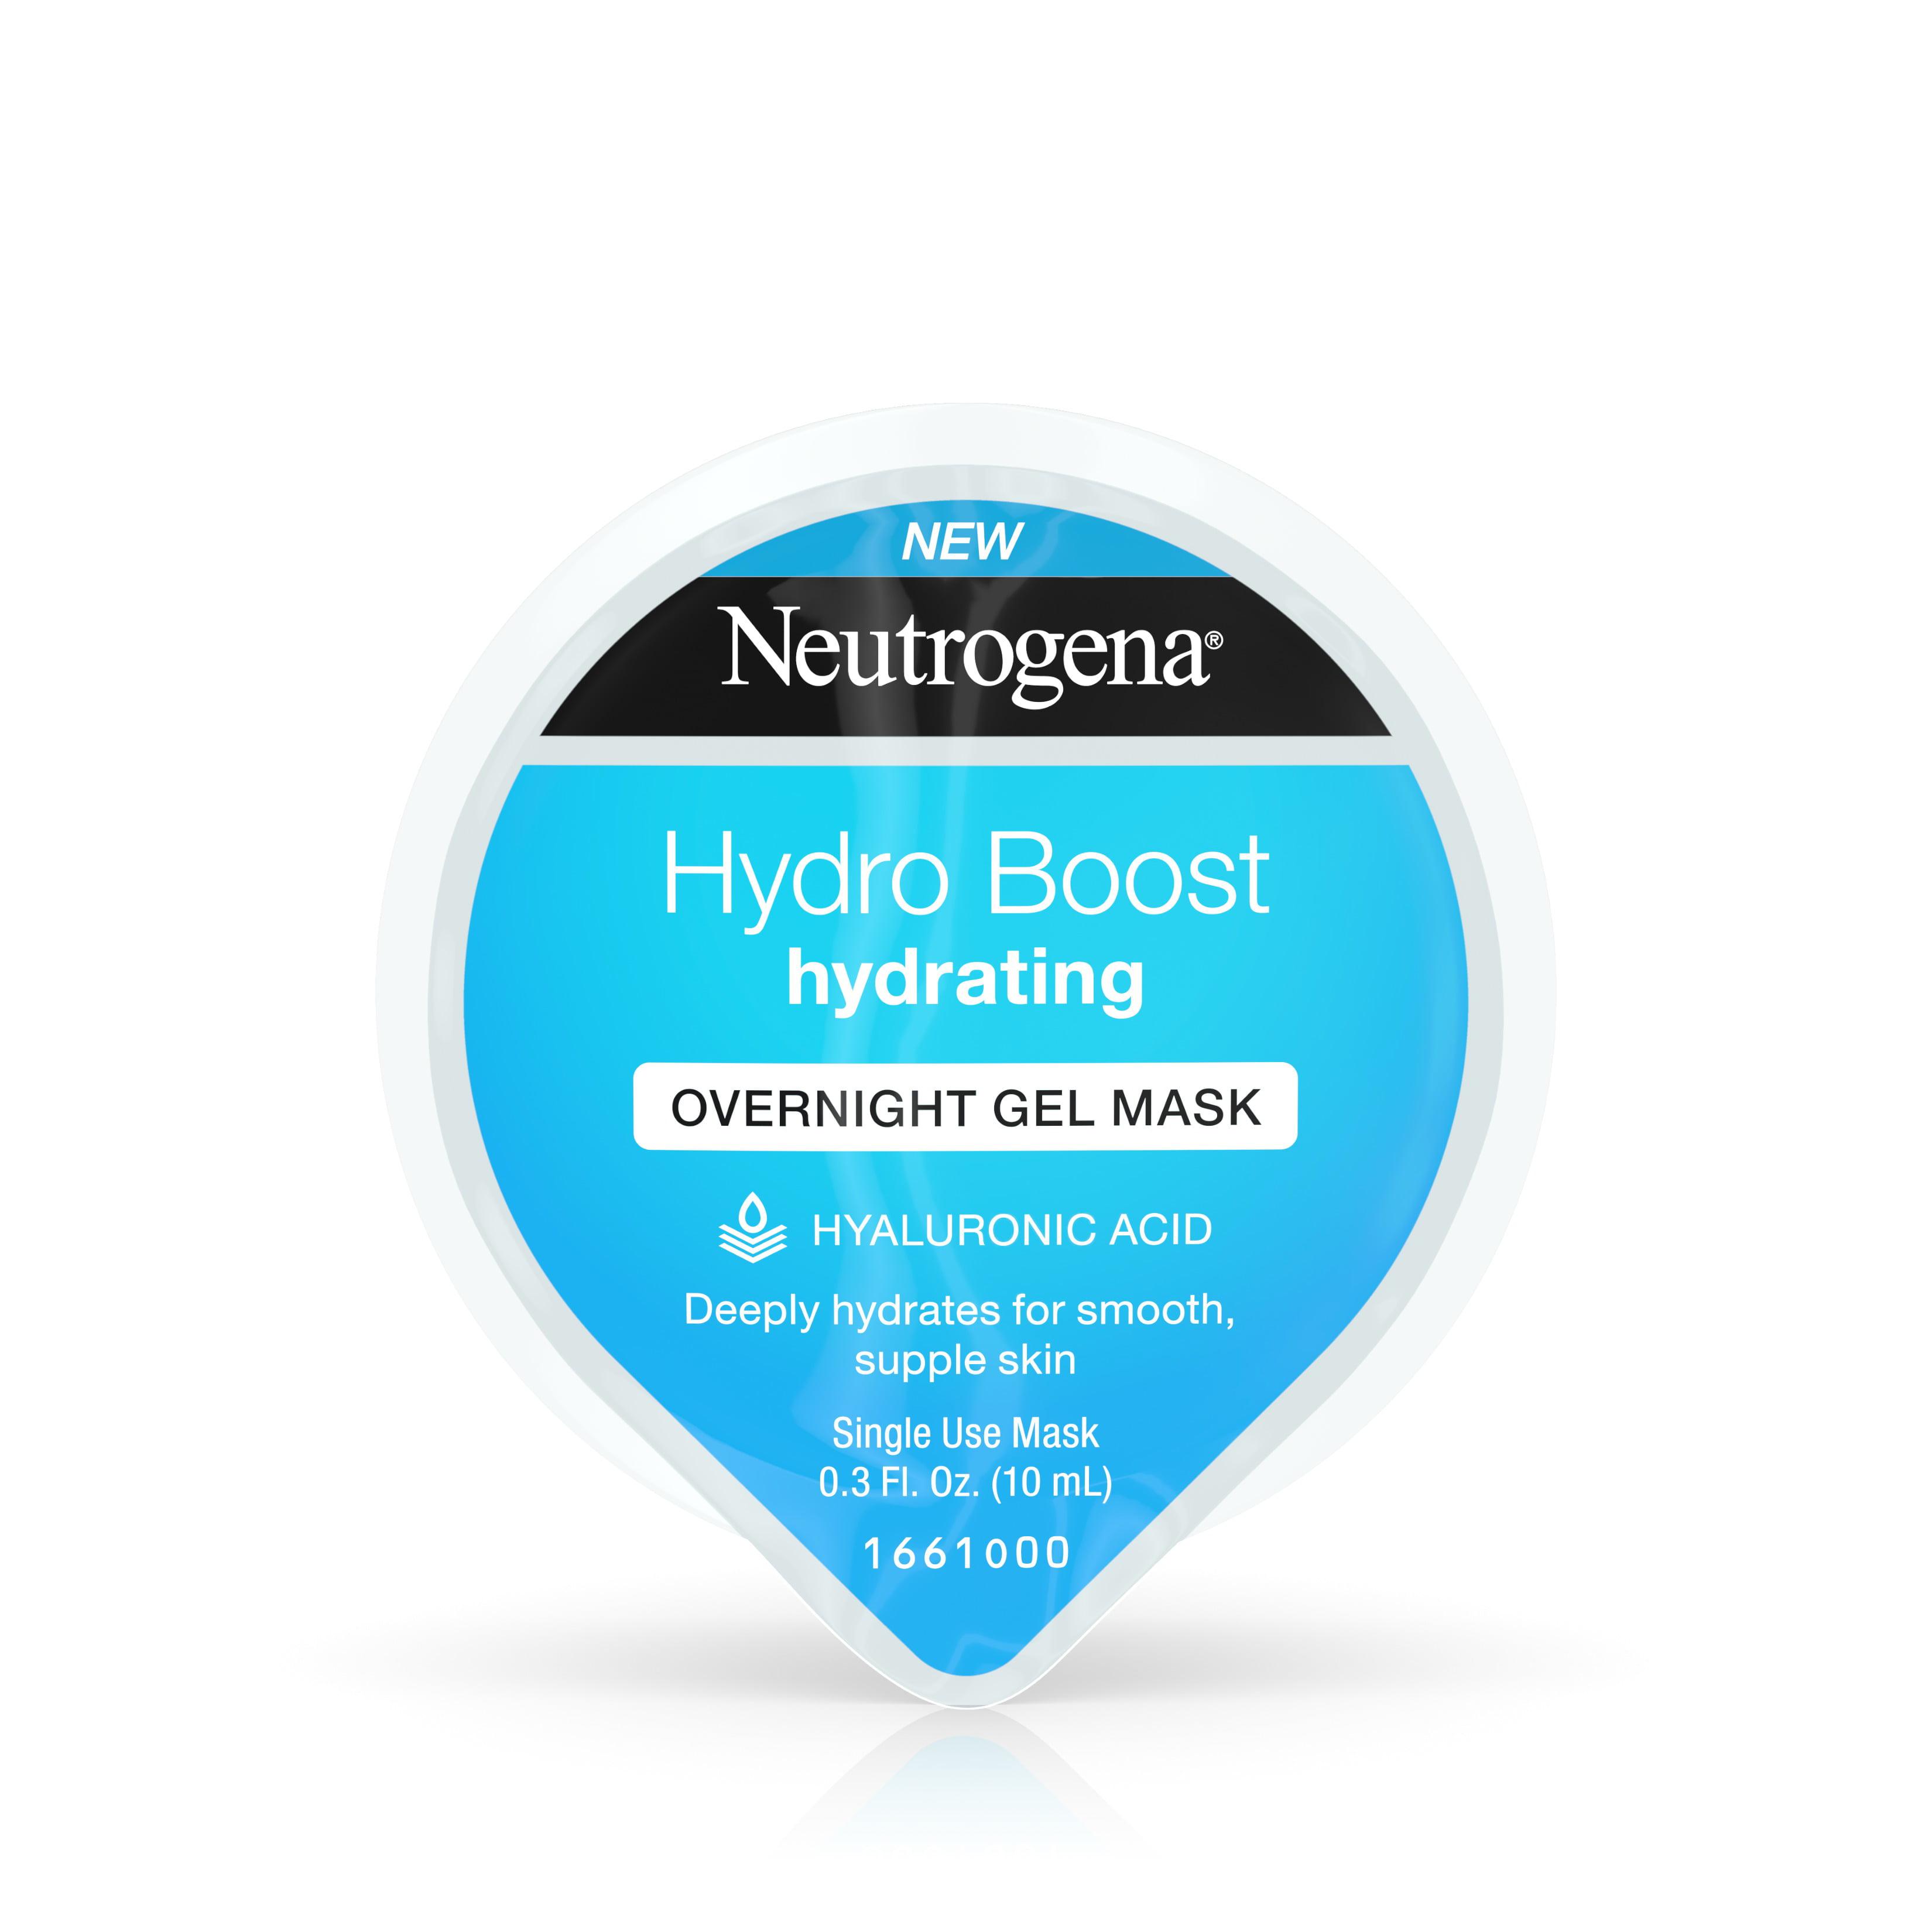 Neutrogena Hydro Boost Moisturizing Overnight Face Mask, 0.3 fl. oz